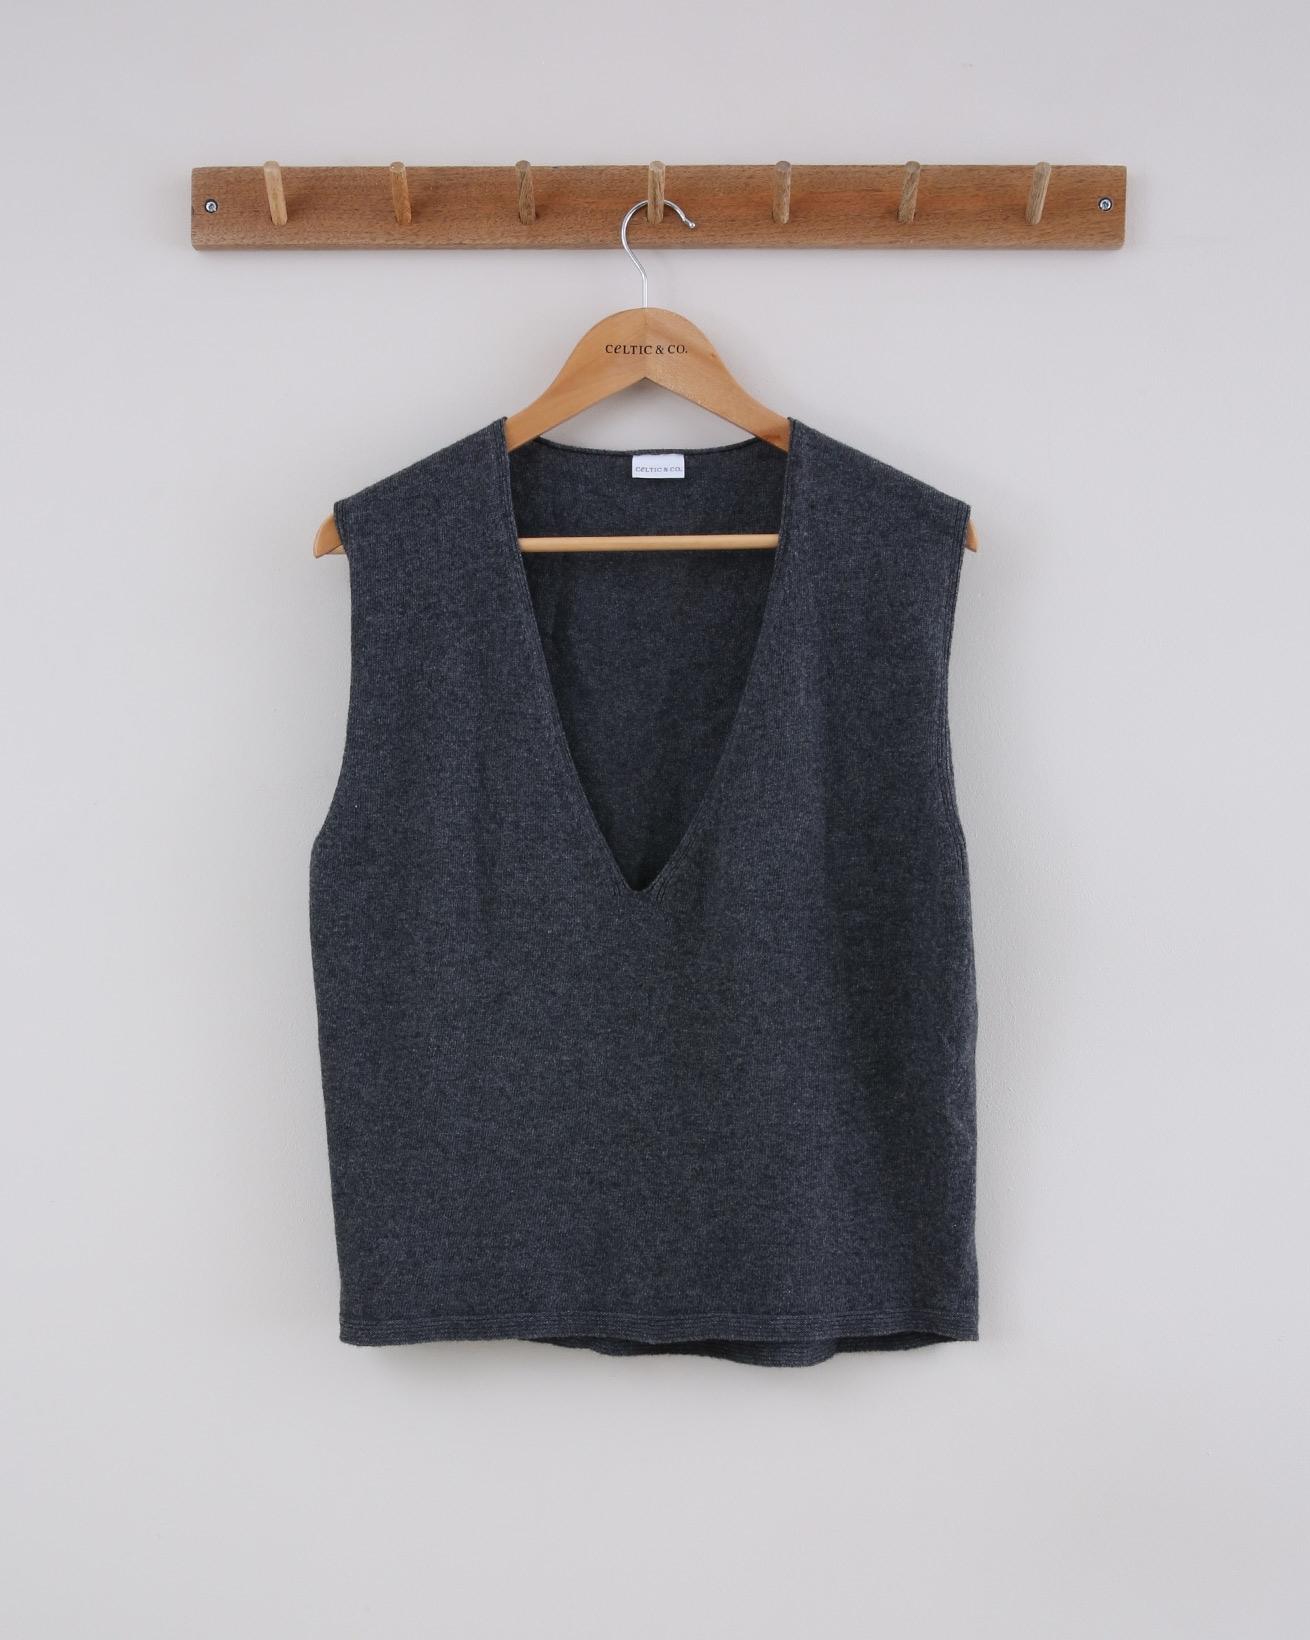 Merino Vest - Size Small - Charcoal- 1524